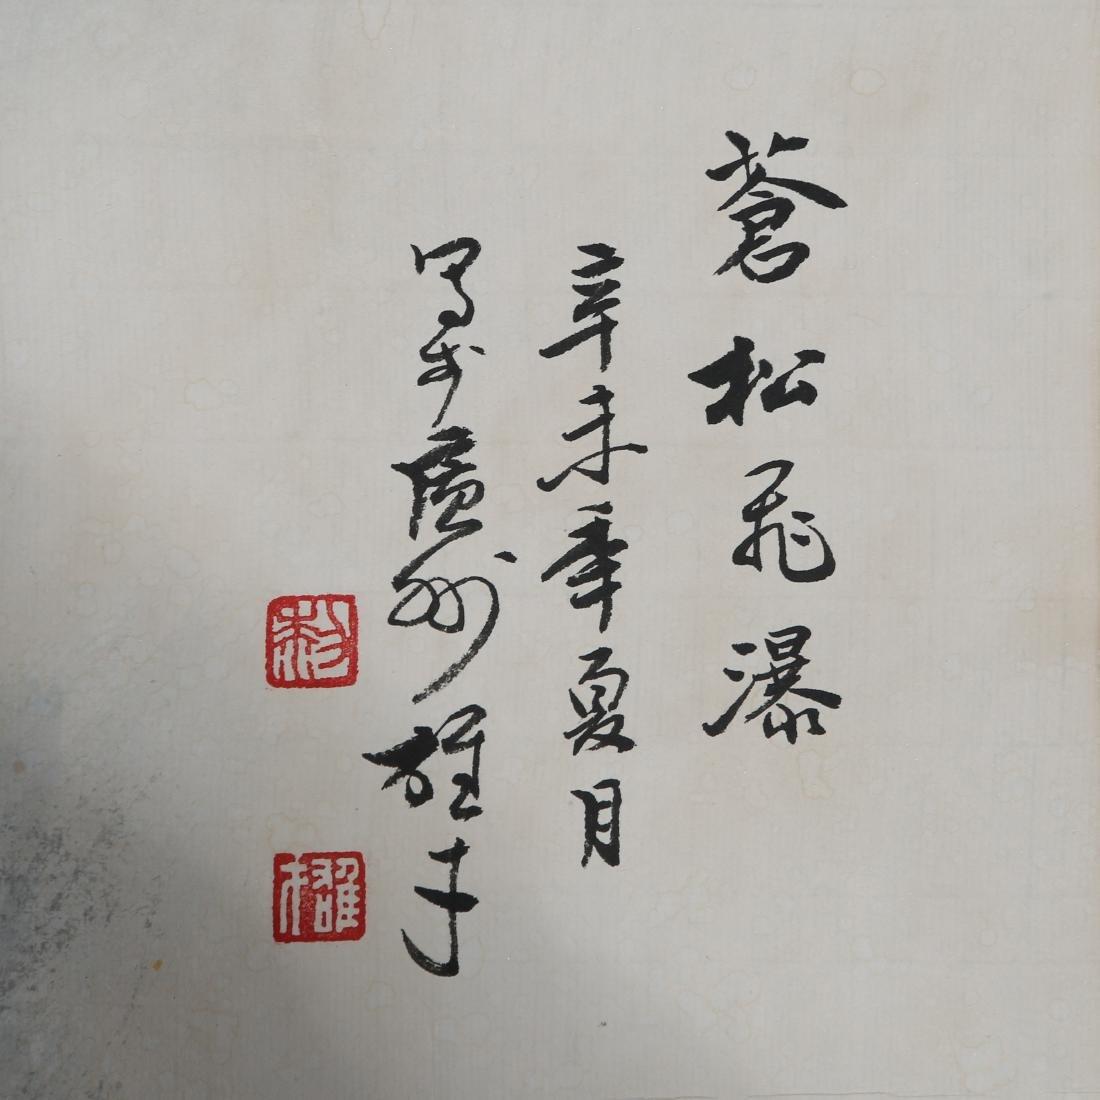 LI XIONGCAI: 'Pine Trees By Waterfall' Hanging Scroll - 4